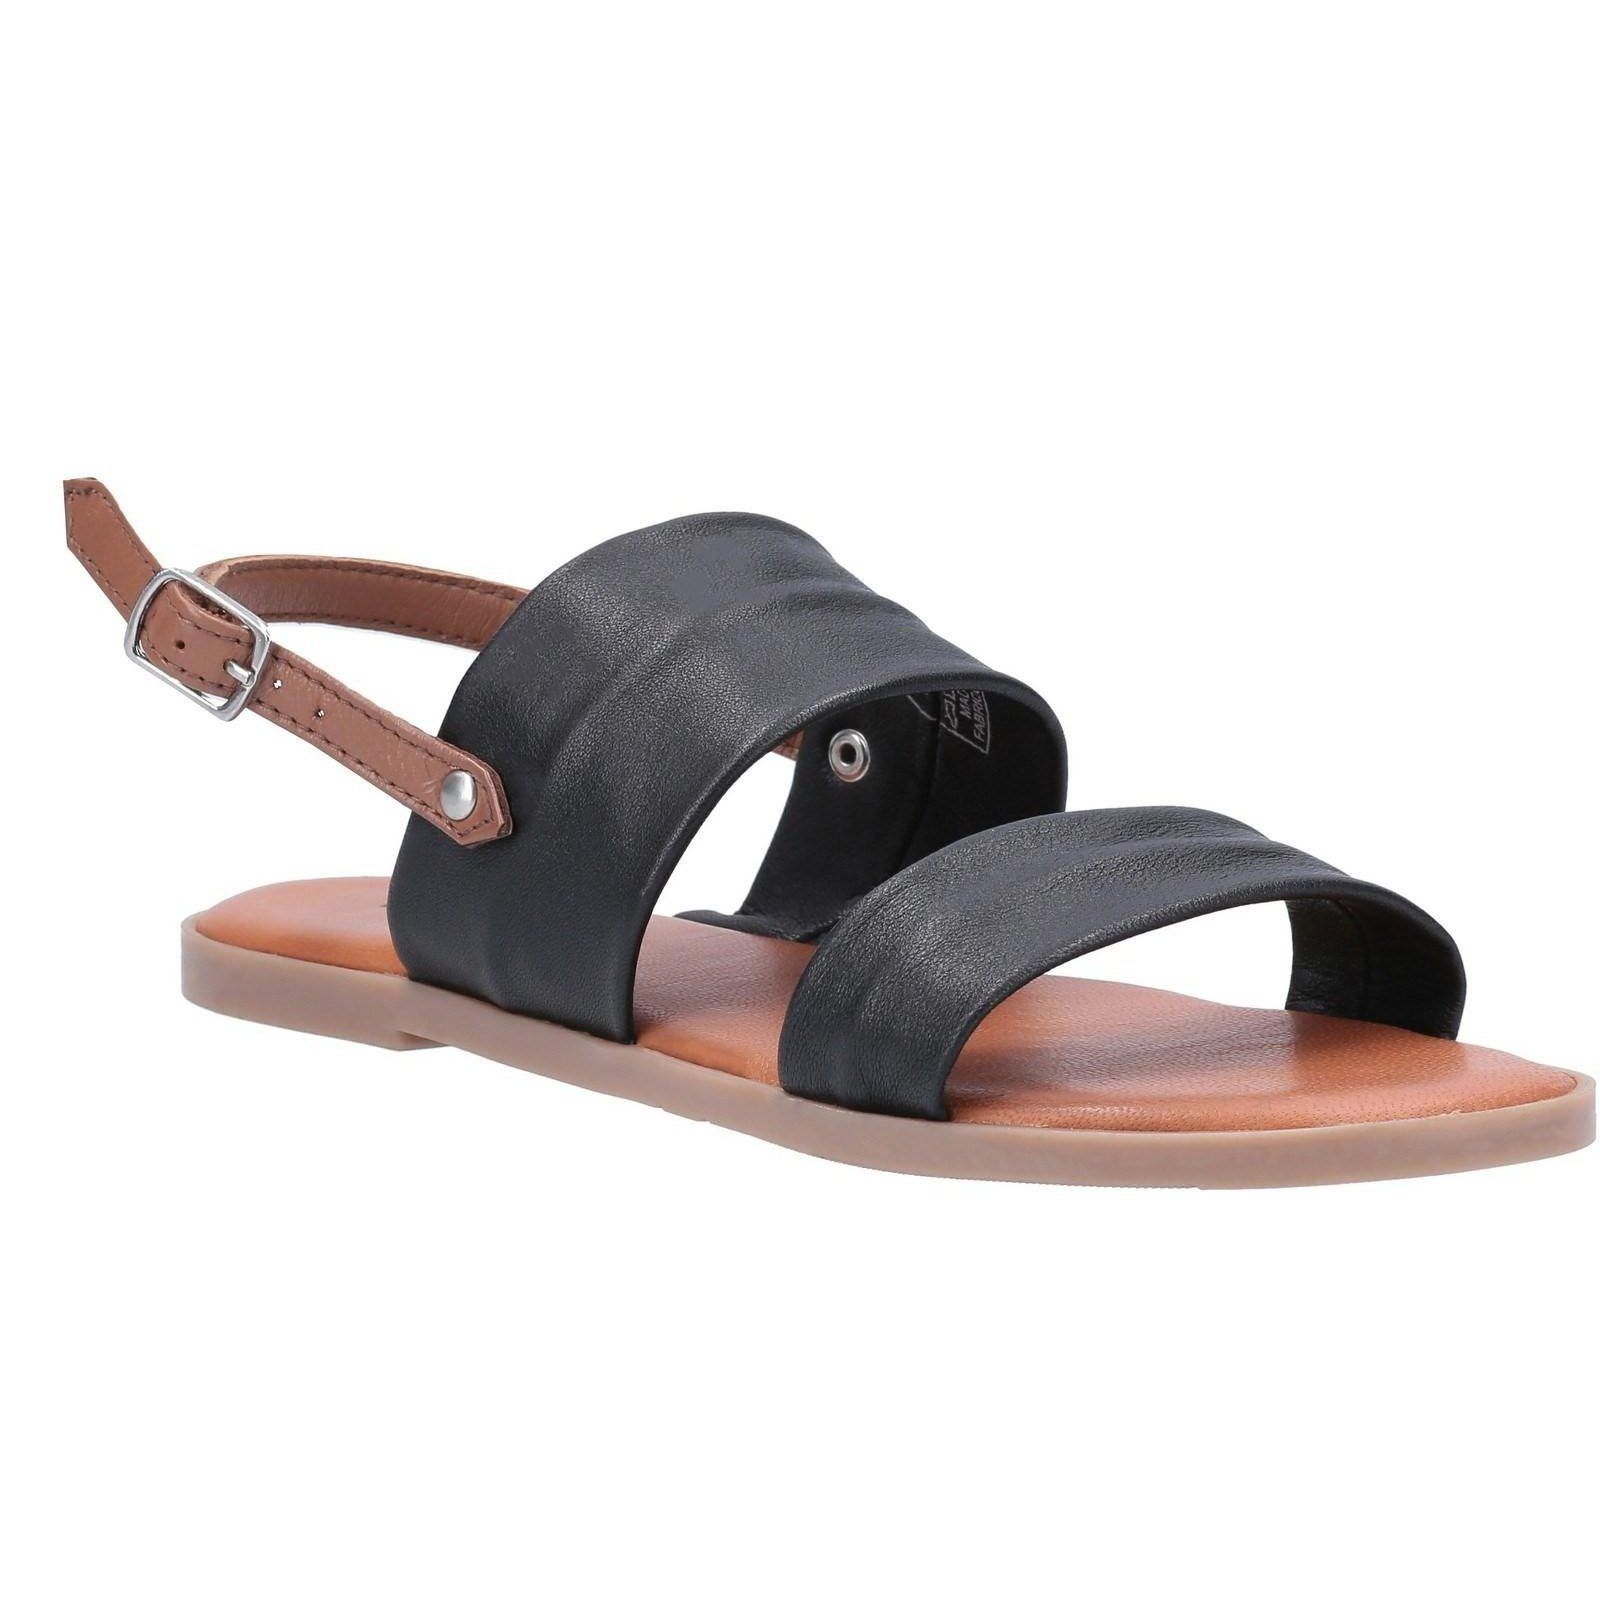 Hush Puppies sandalen »Damen Maria Schnalle Leder«